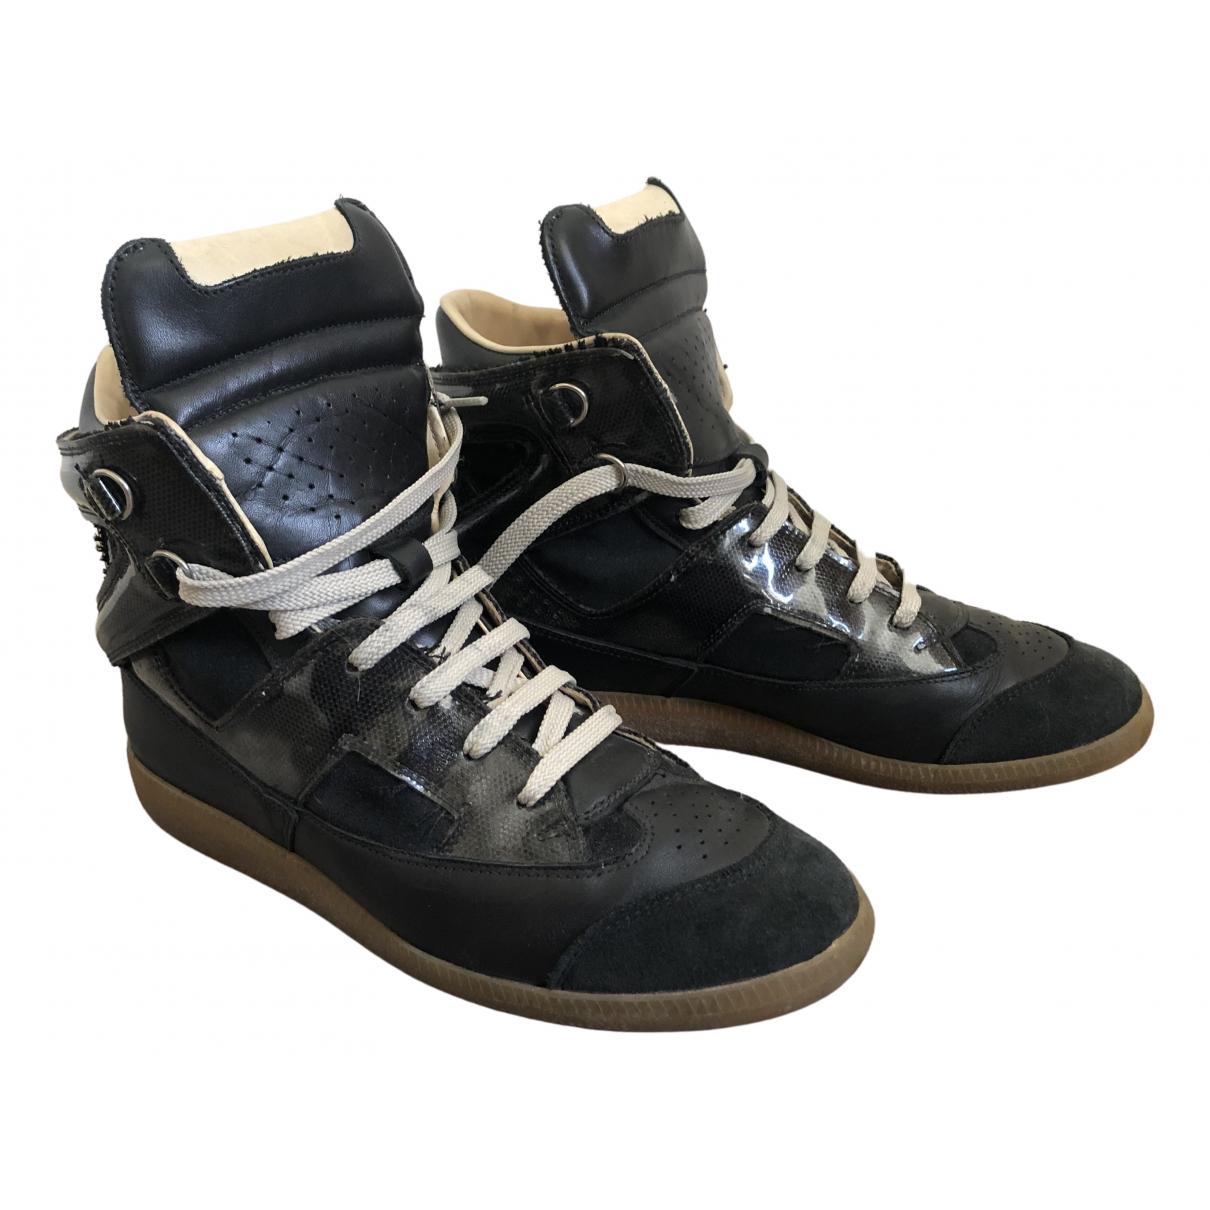 Maison Martin Margiela \N Black Leather Trainers for Women 41 EU